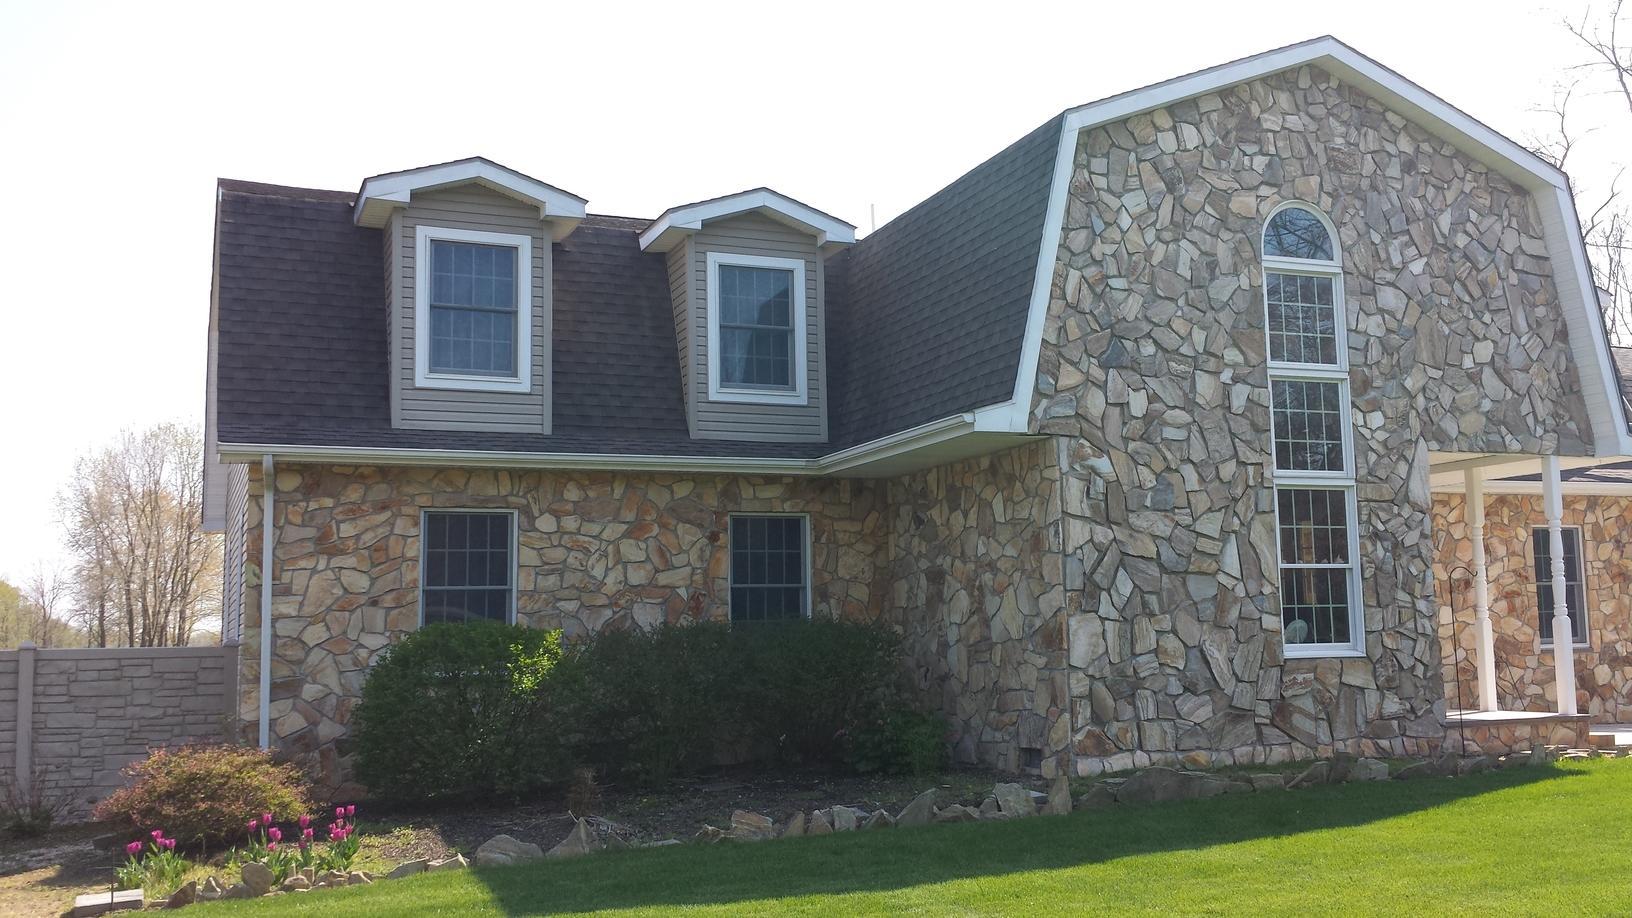 Replacing Asphalt Shingles on Gambrel-Style Roof in Clayton, DE